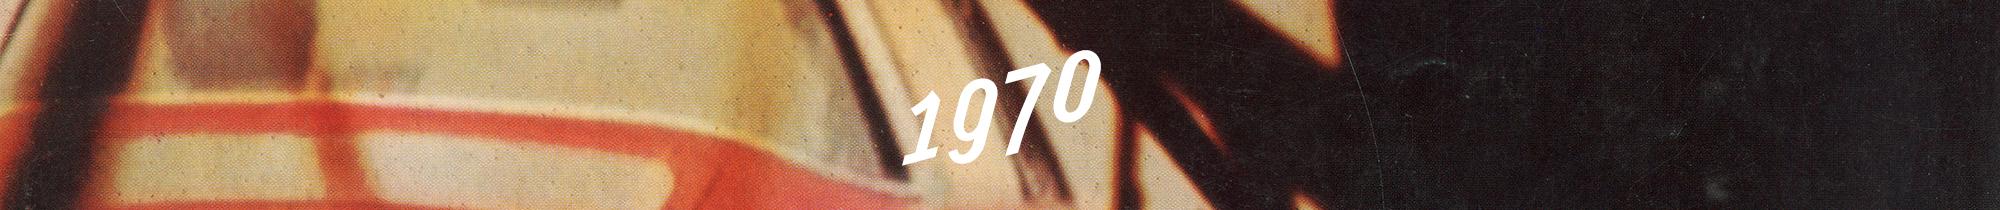 petit-slider-brochure-christo-1970